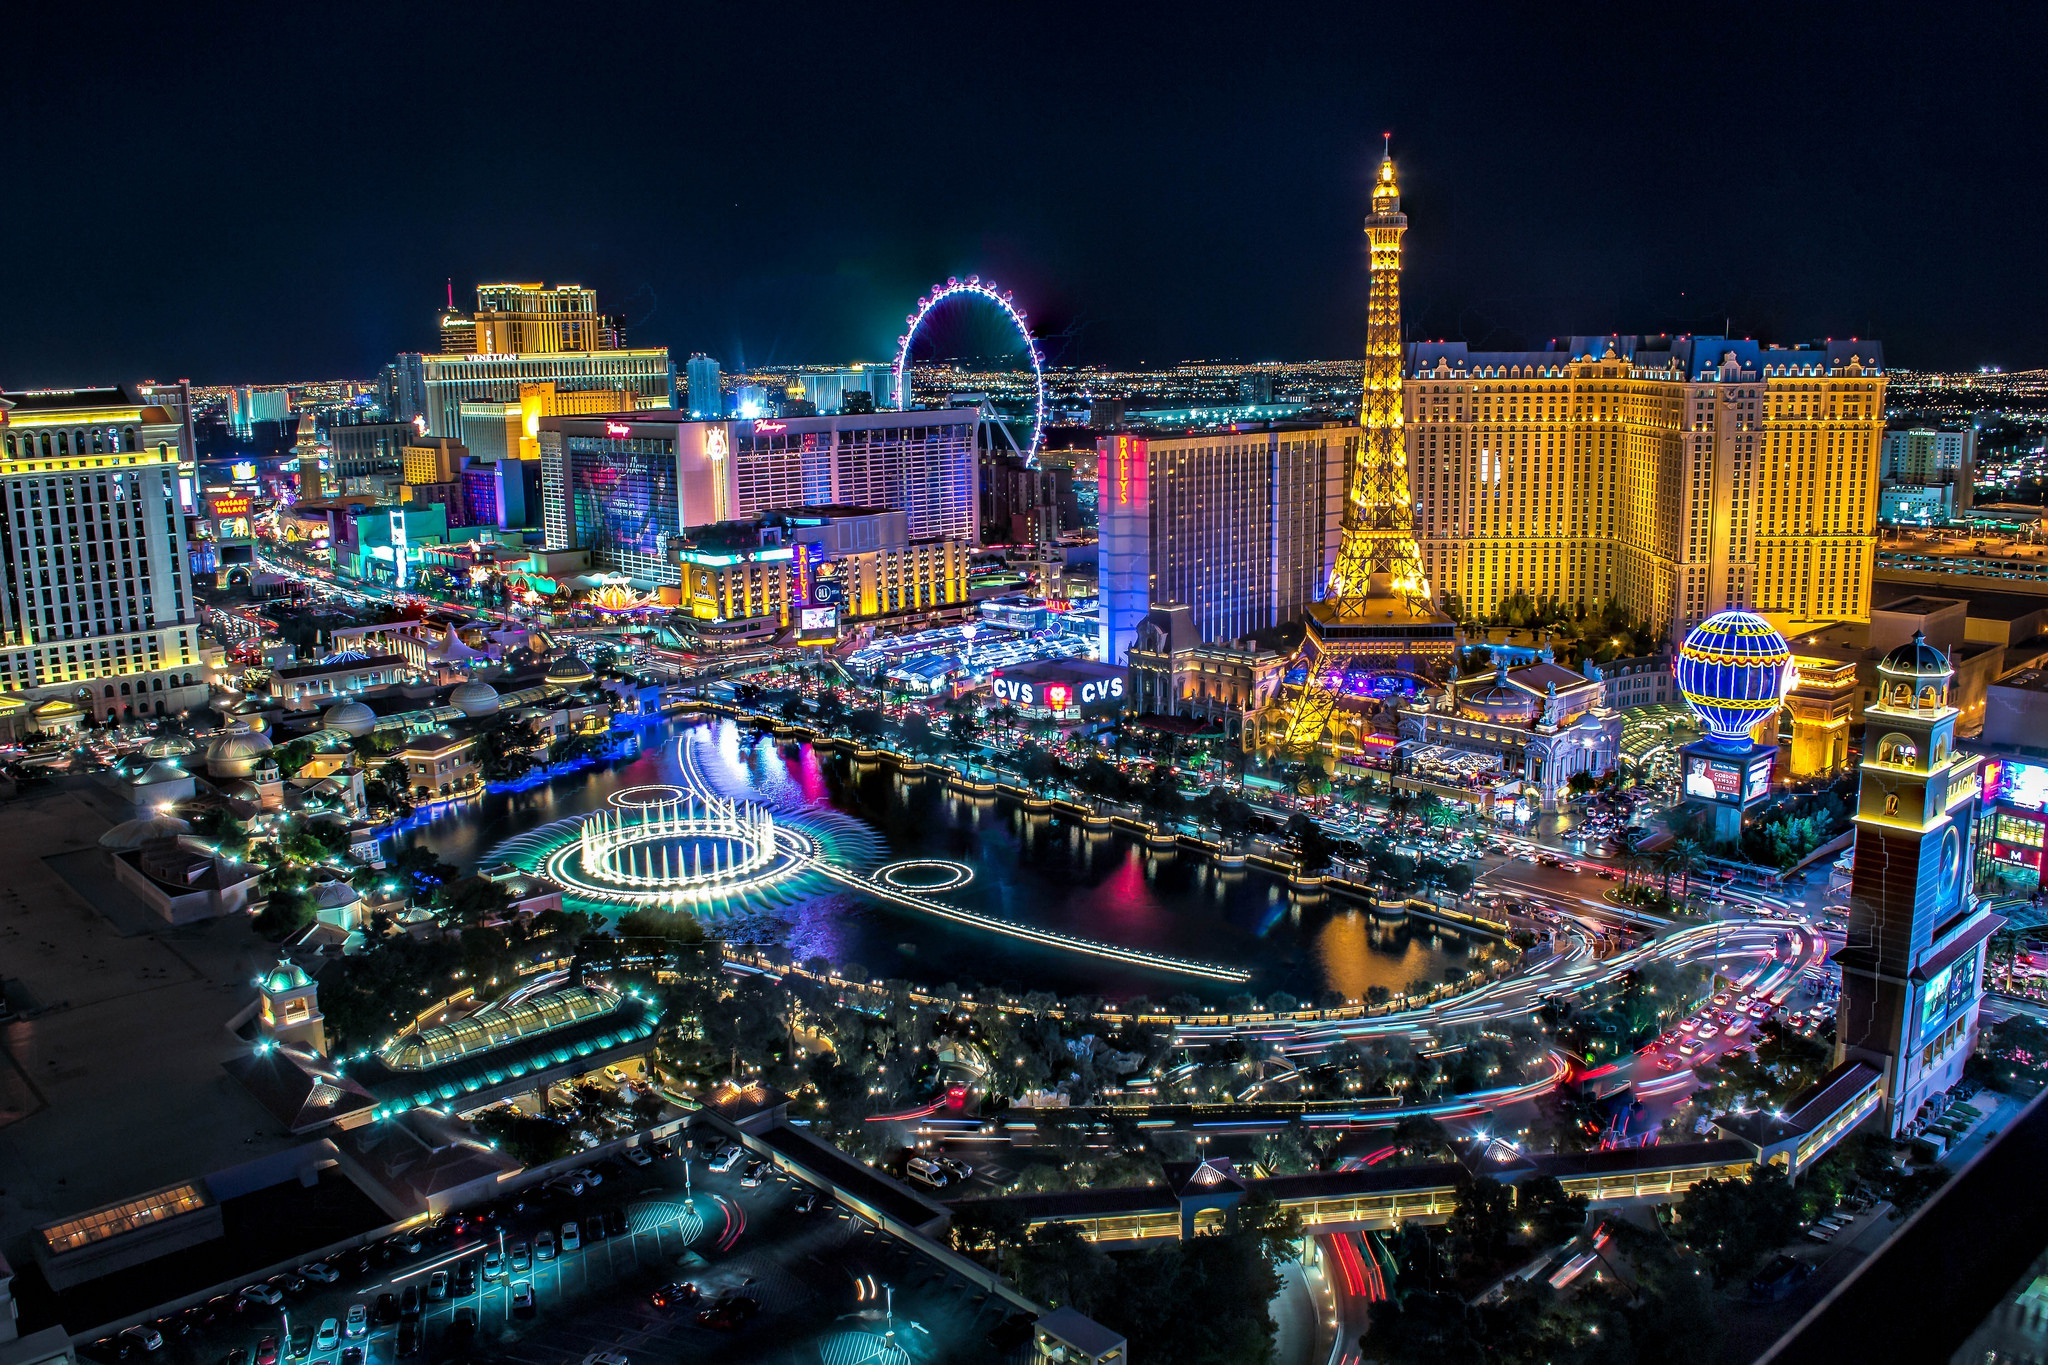 Las Vegas Hd Wallpaper Background Image 2048x1365 Id 825871